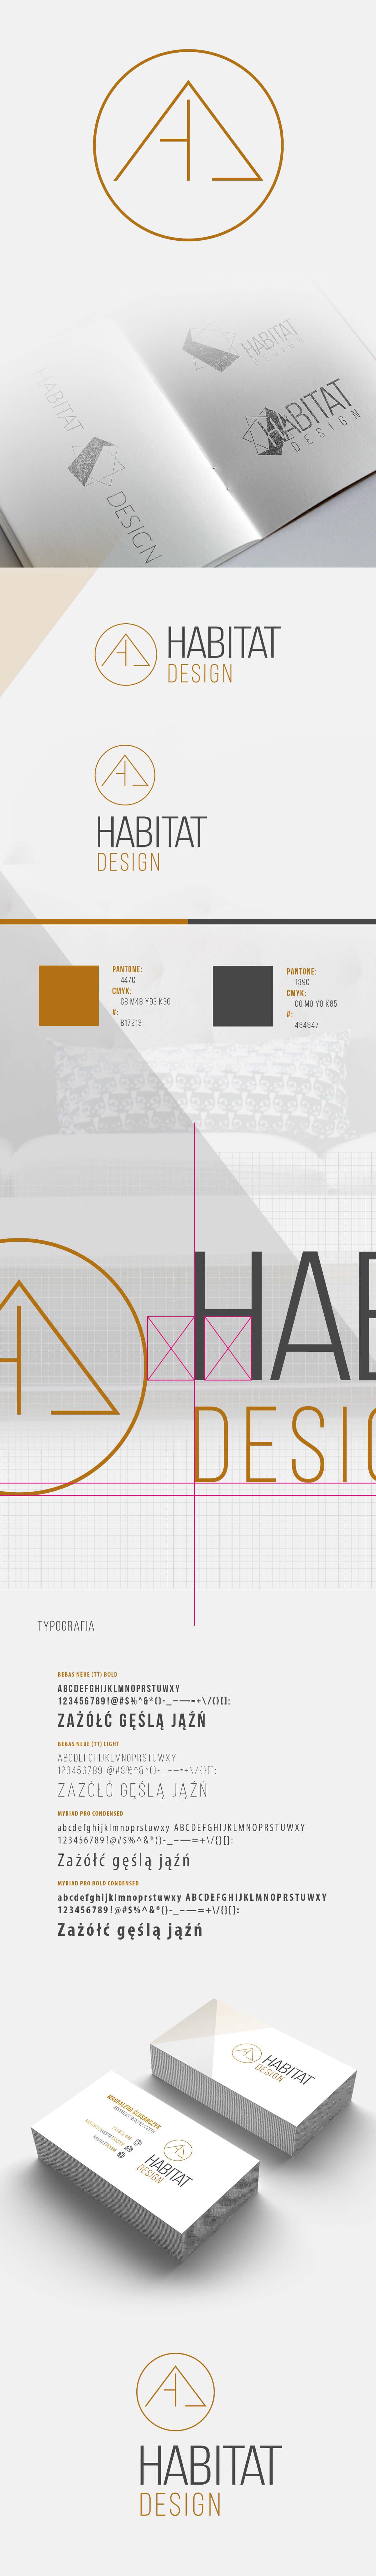 Habitat_Design-SHOWCASE-jakub_slusarczyk_kompres